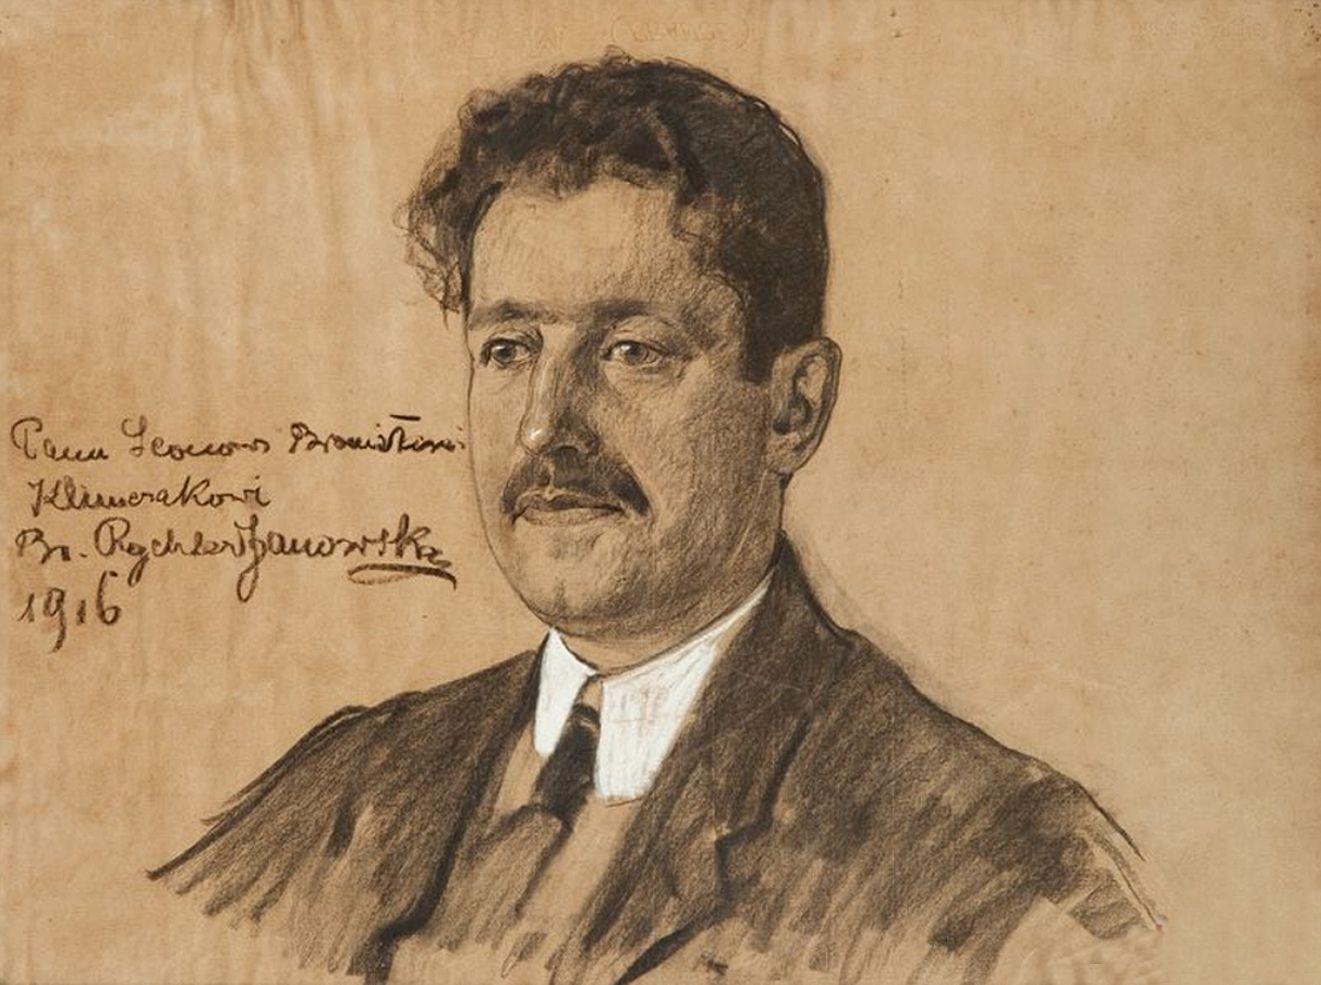 Броніслава Яновська. Леон Клімчак, 1916; папір, олівець